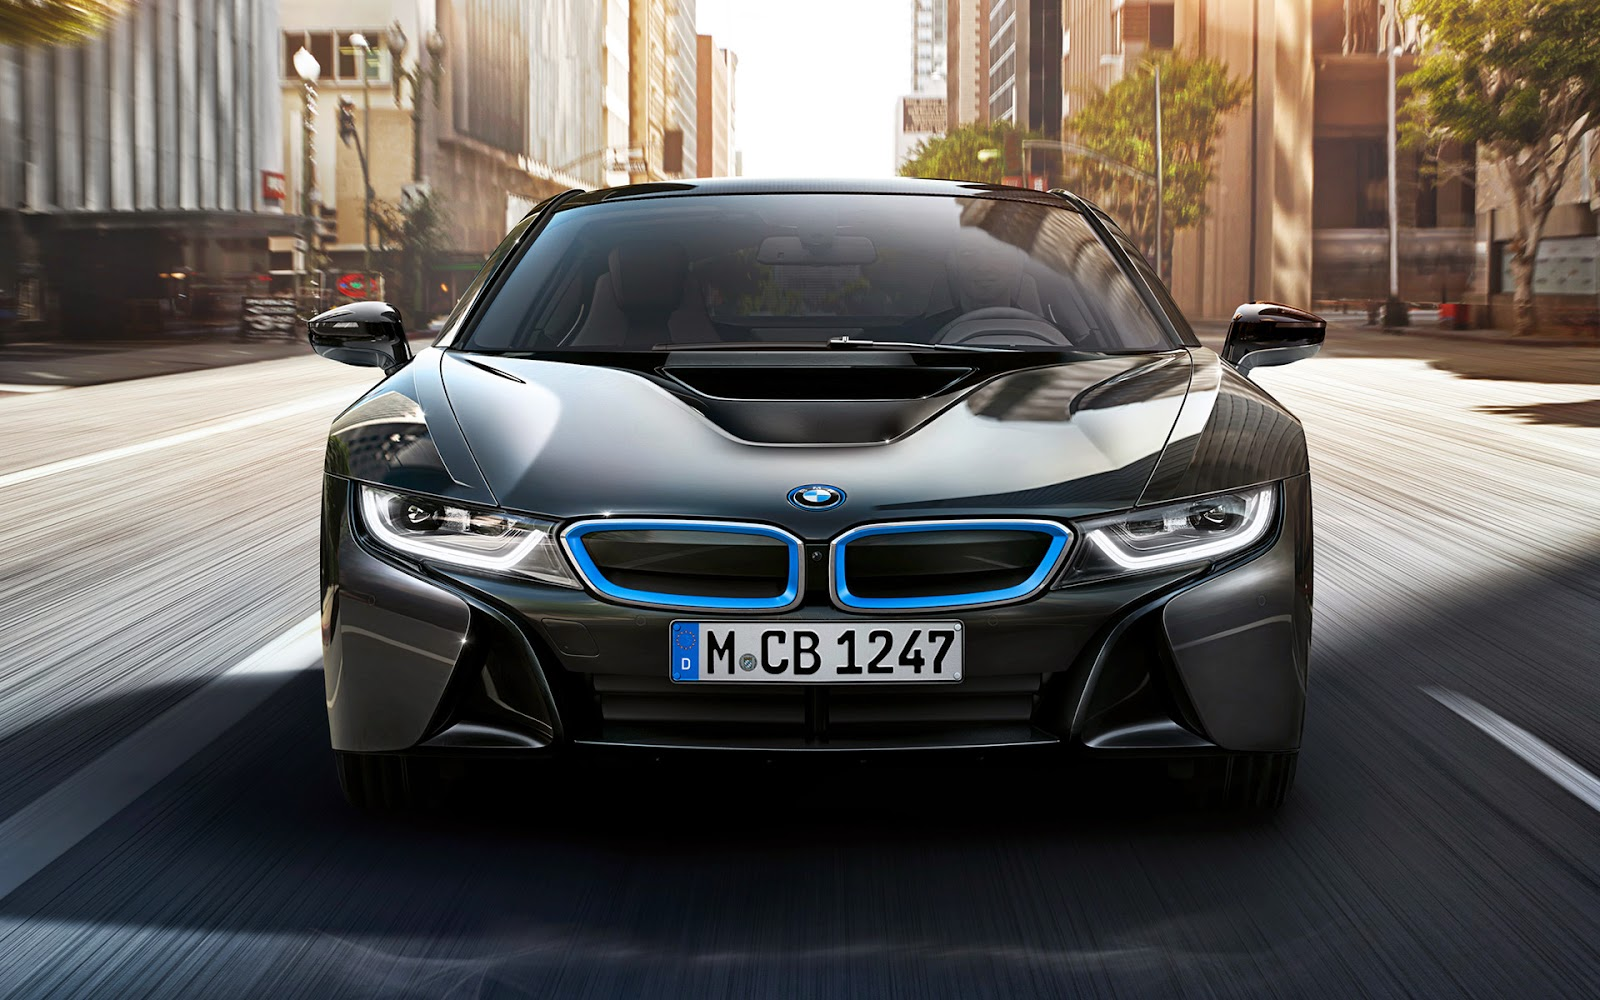 BMW%2Bi8%2Bcar